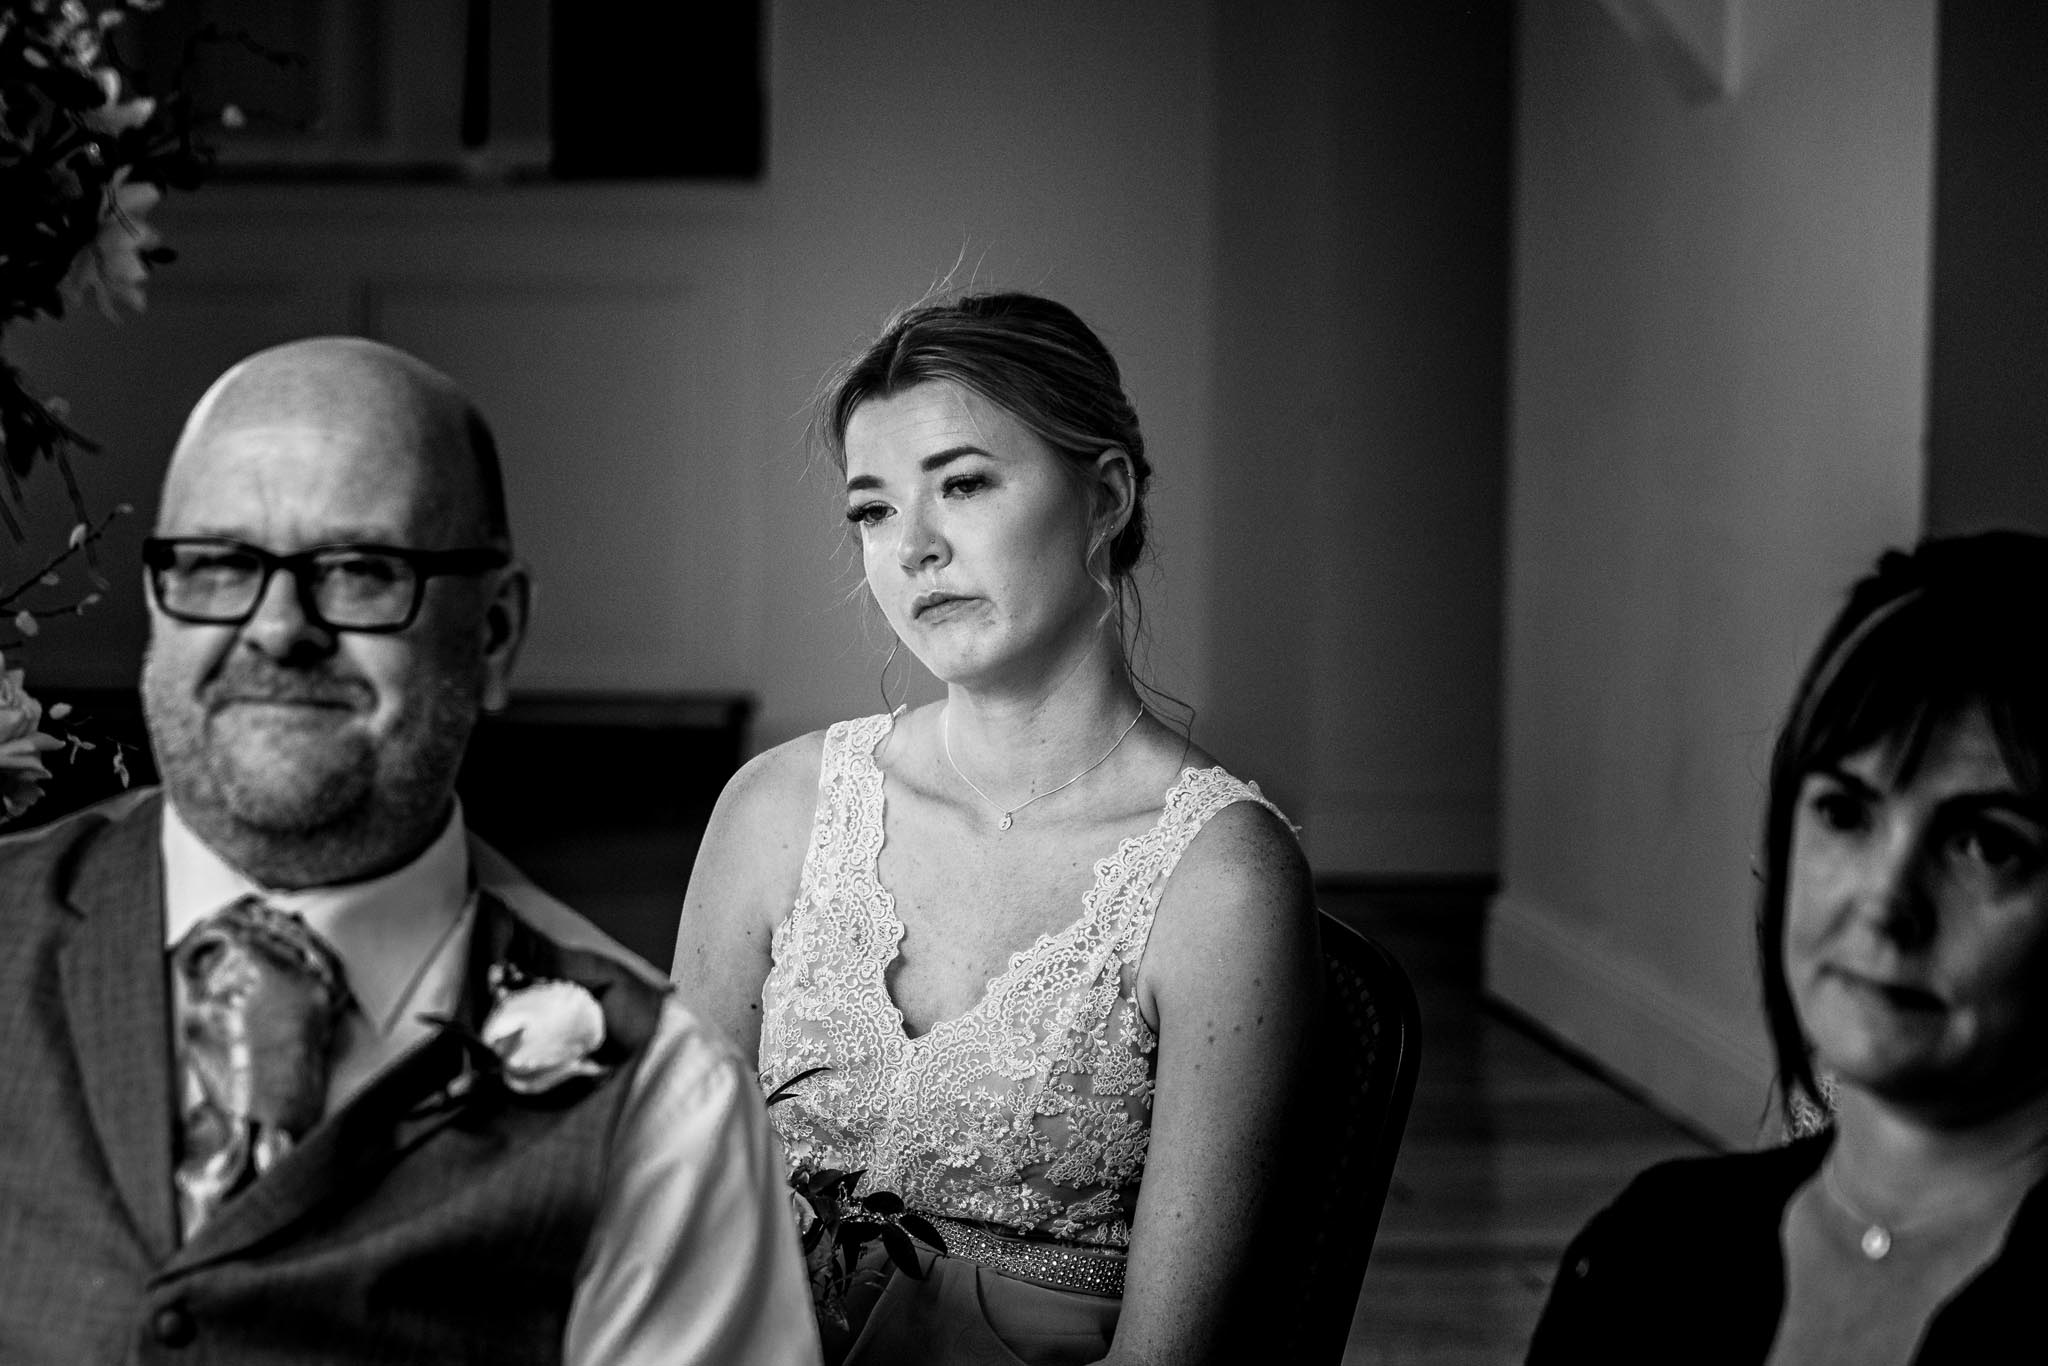 334-Ceremony-Luke-Yasmin-The-Rayleigh-Club-Wedding-Photography.jpg